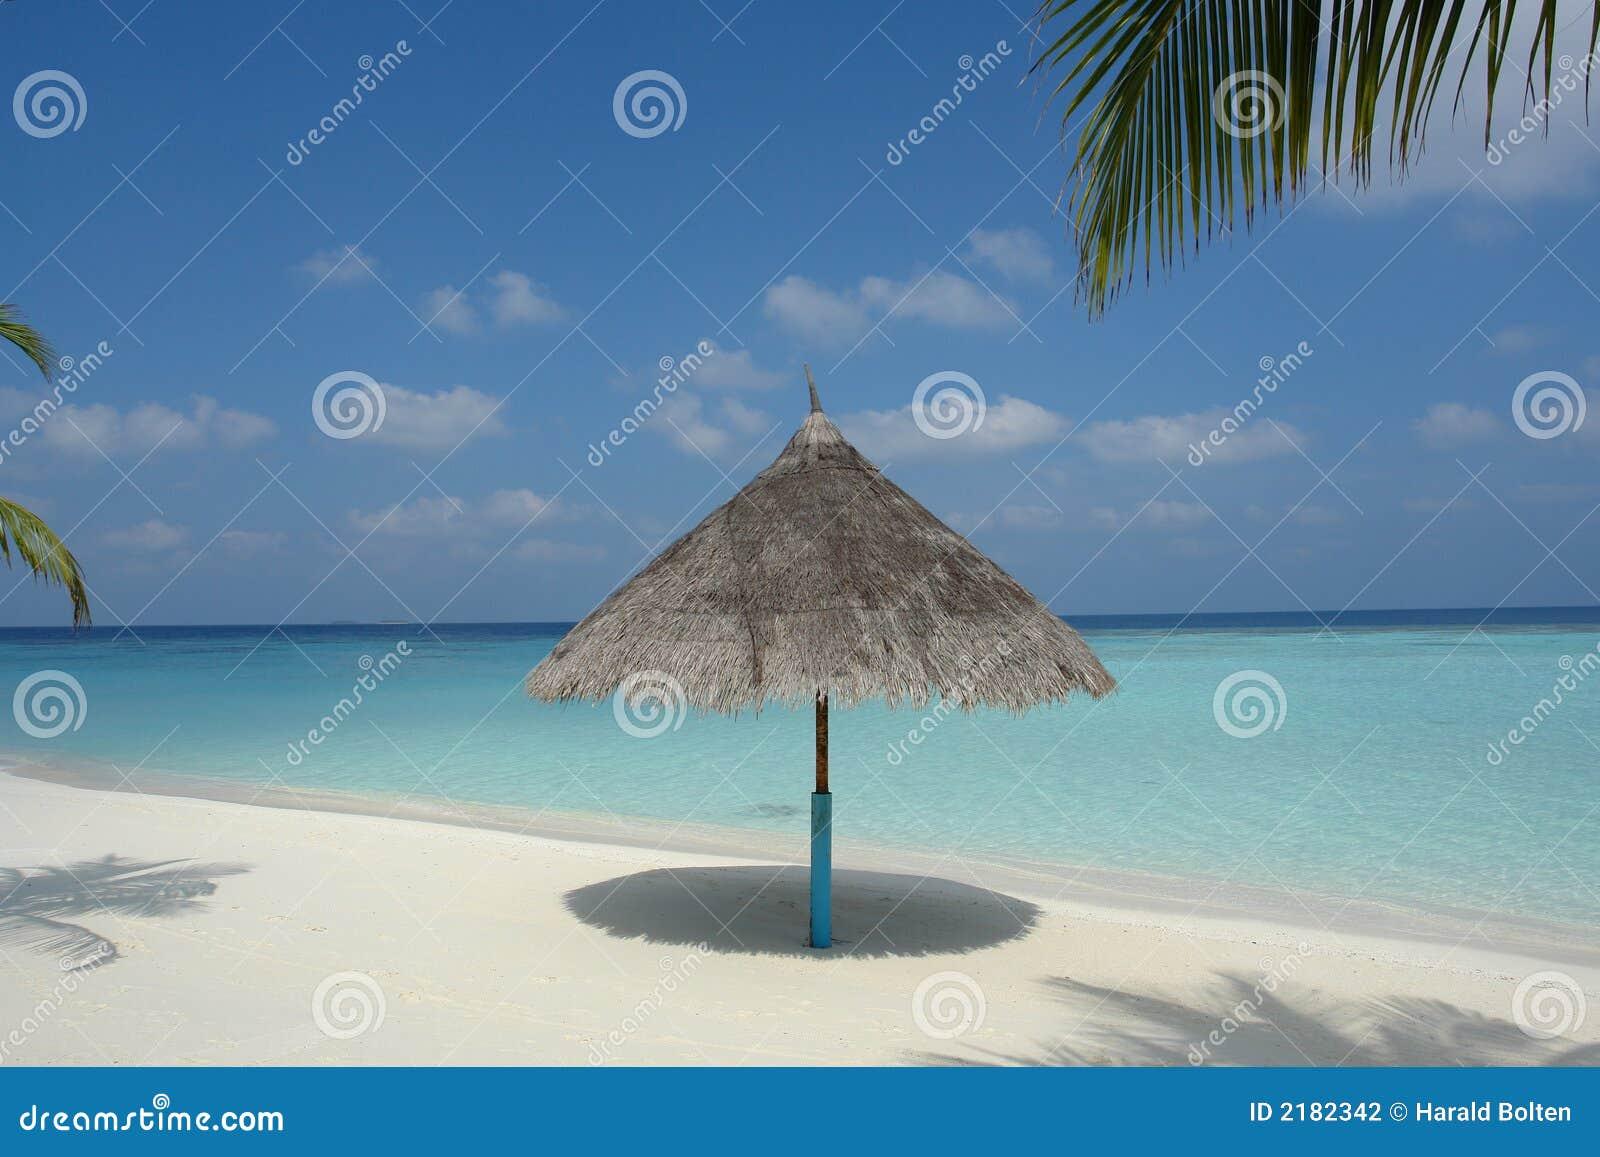 Praia em um console Maldive